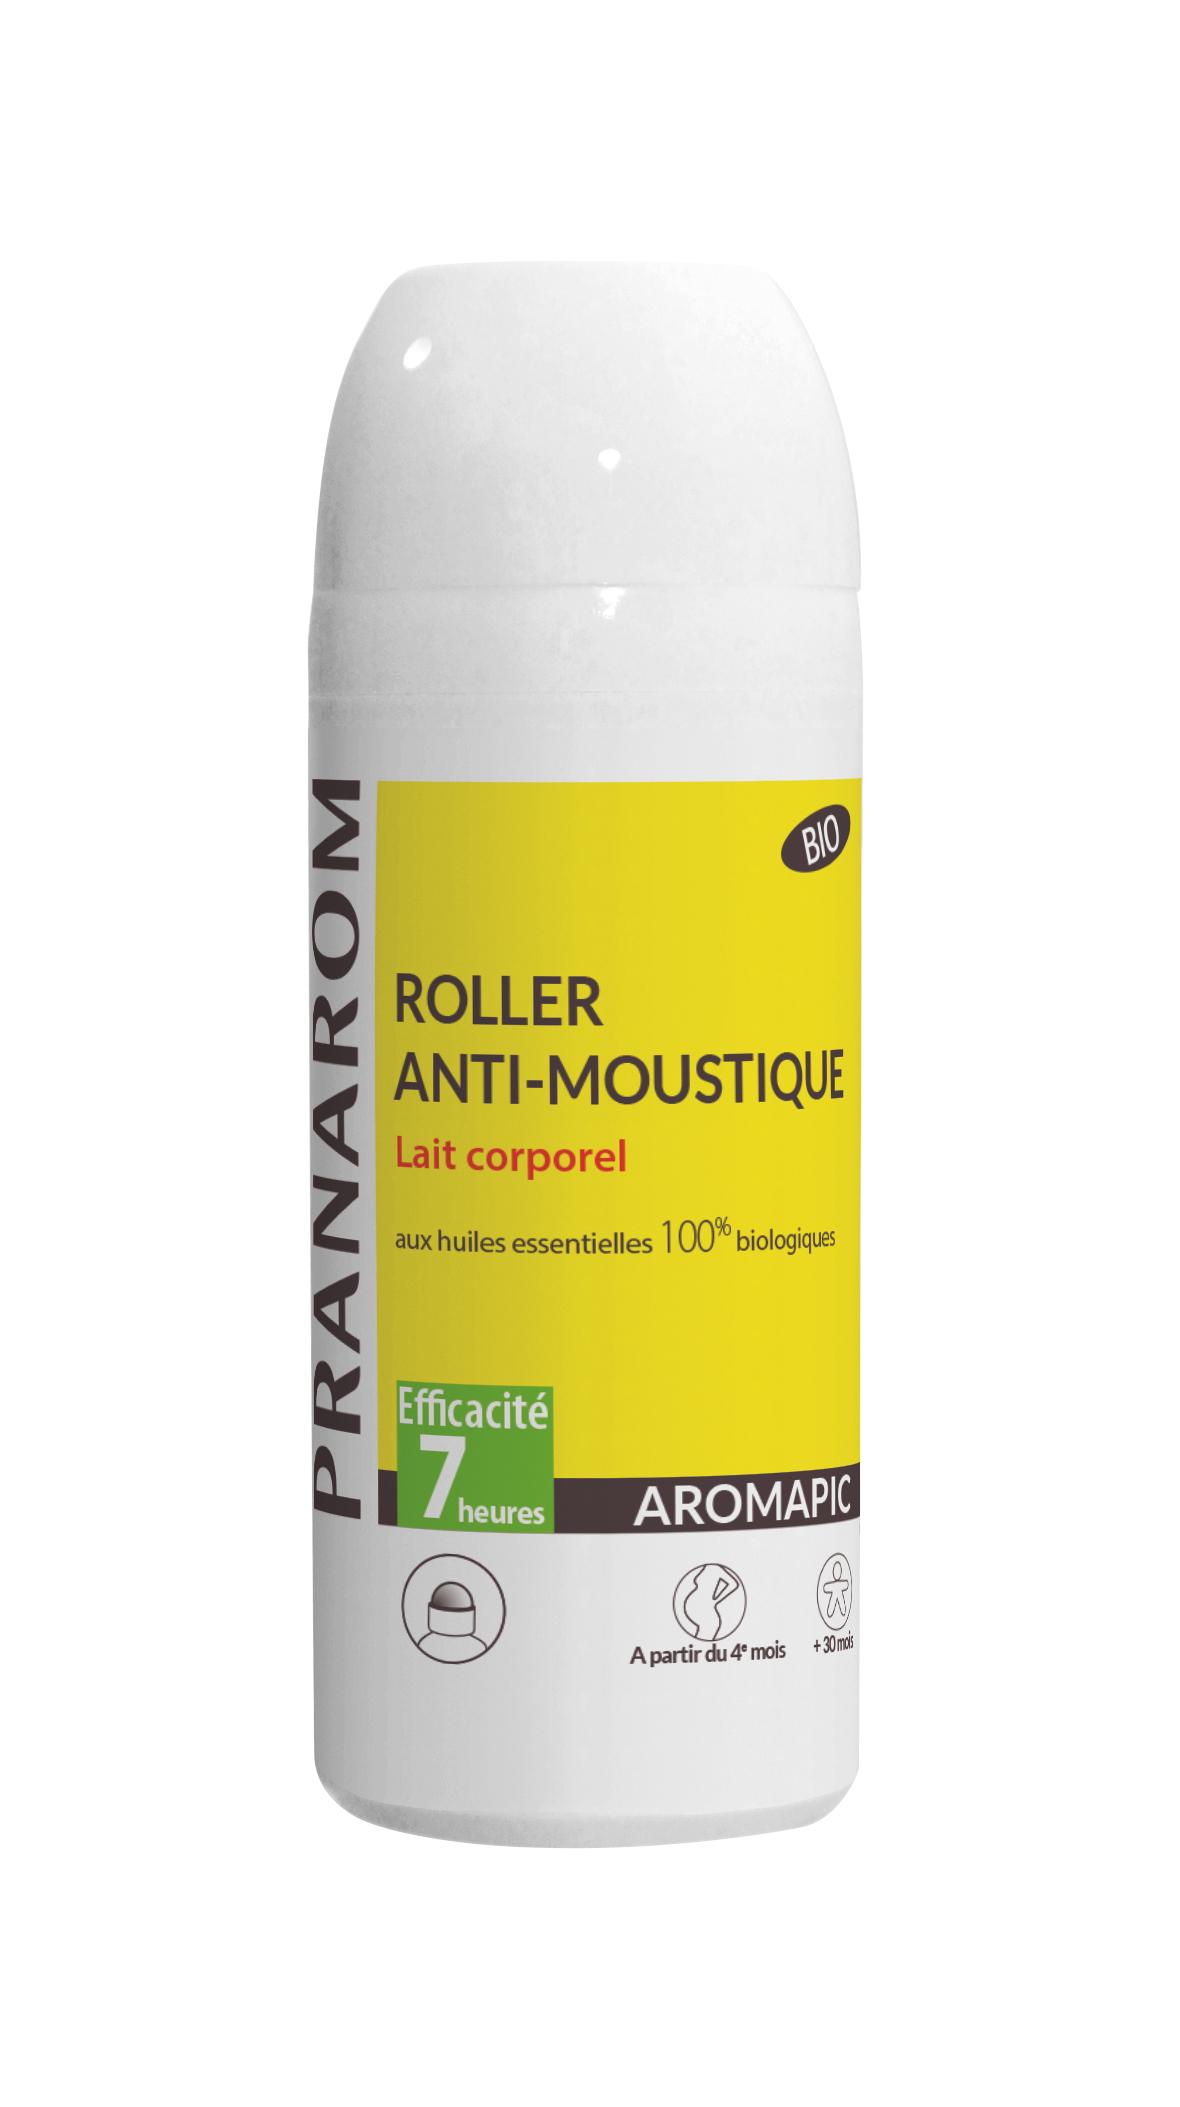 pranarom_Aromapic_Roller_lait_corporel